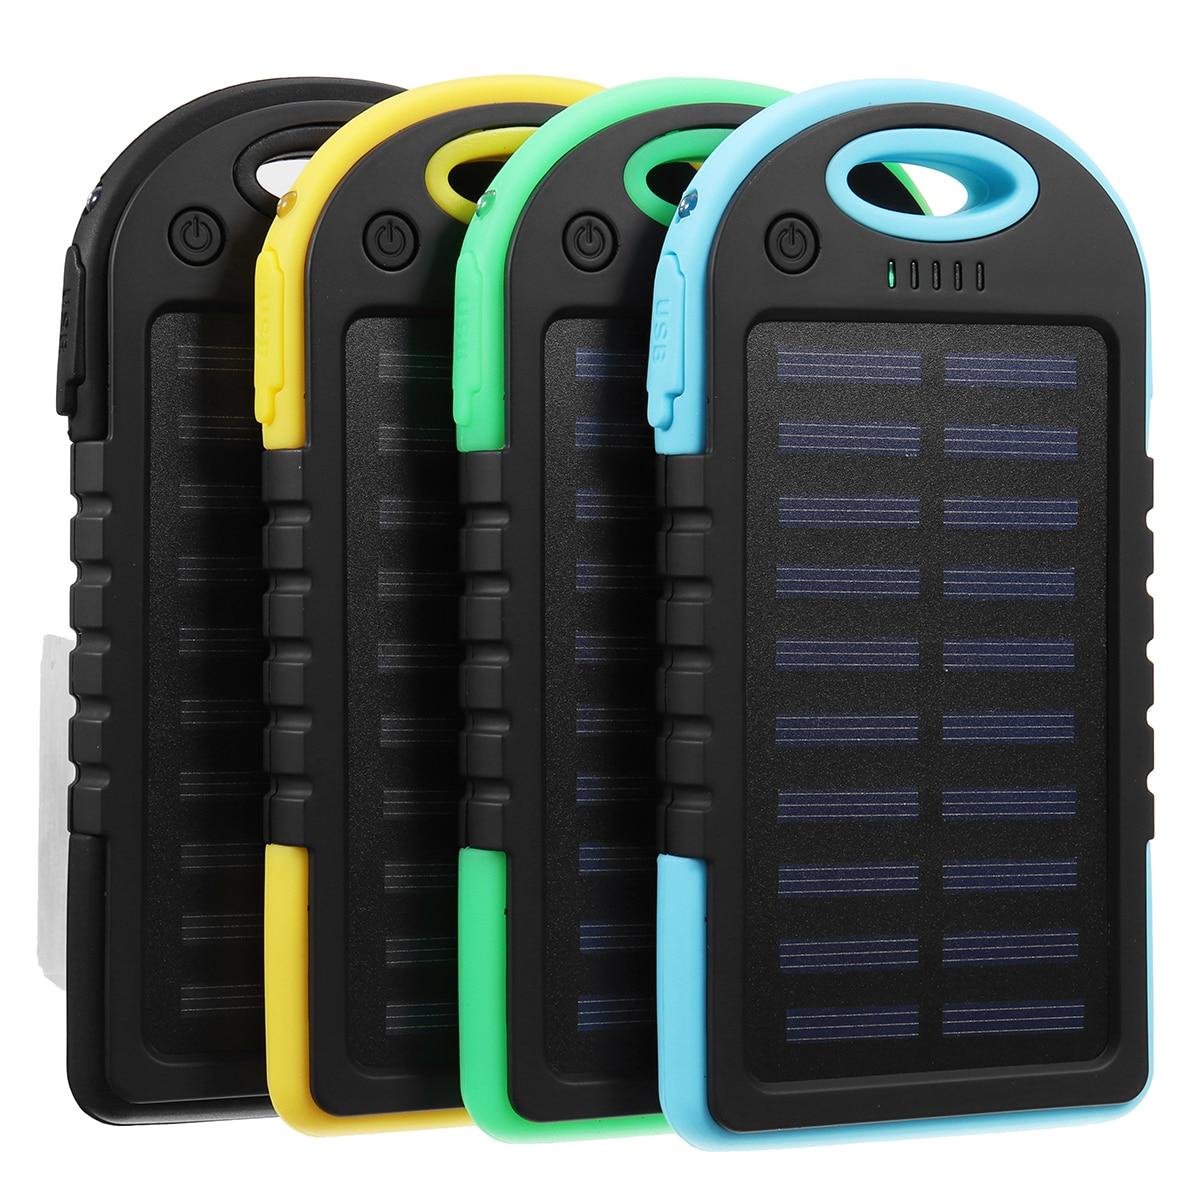 Tragbare 30000 mah Solar Power Bank USB Batterie Ladegerät Für Telefon Tablet Notebook